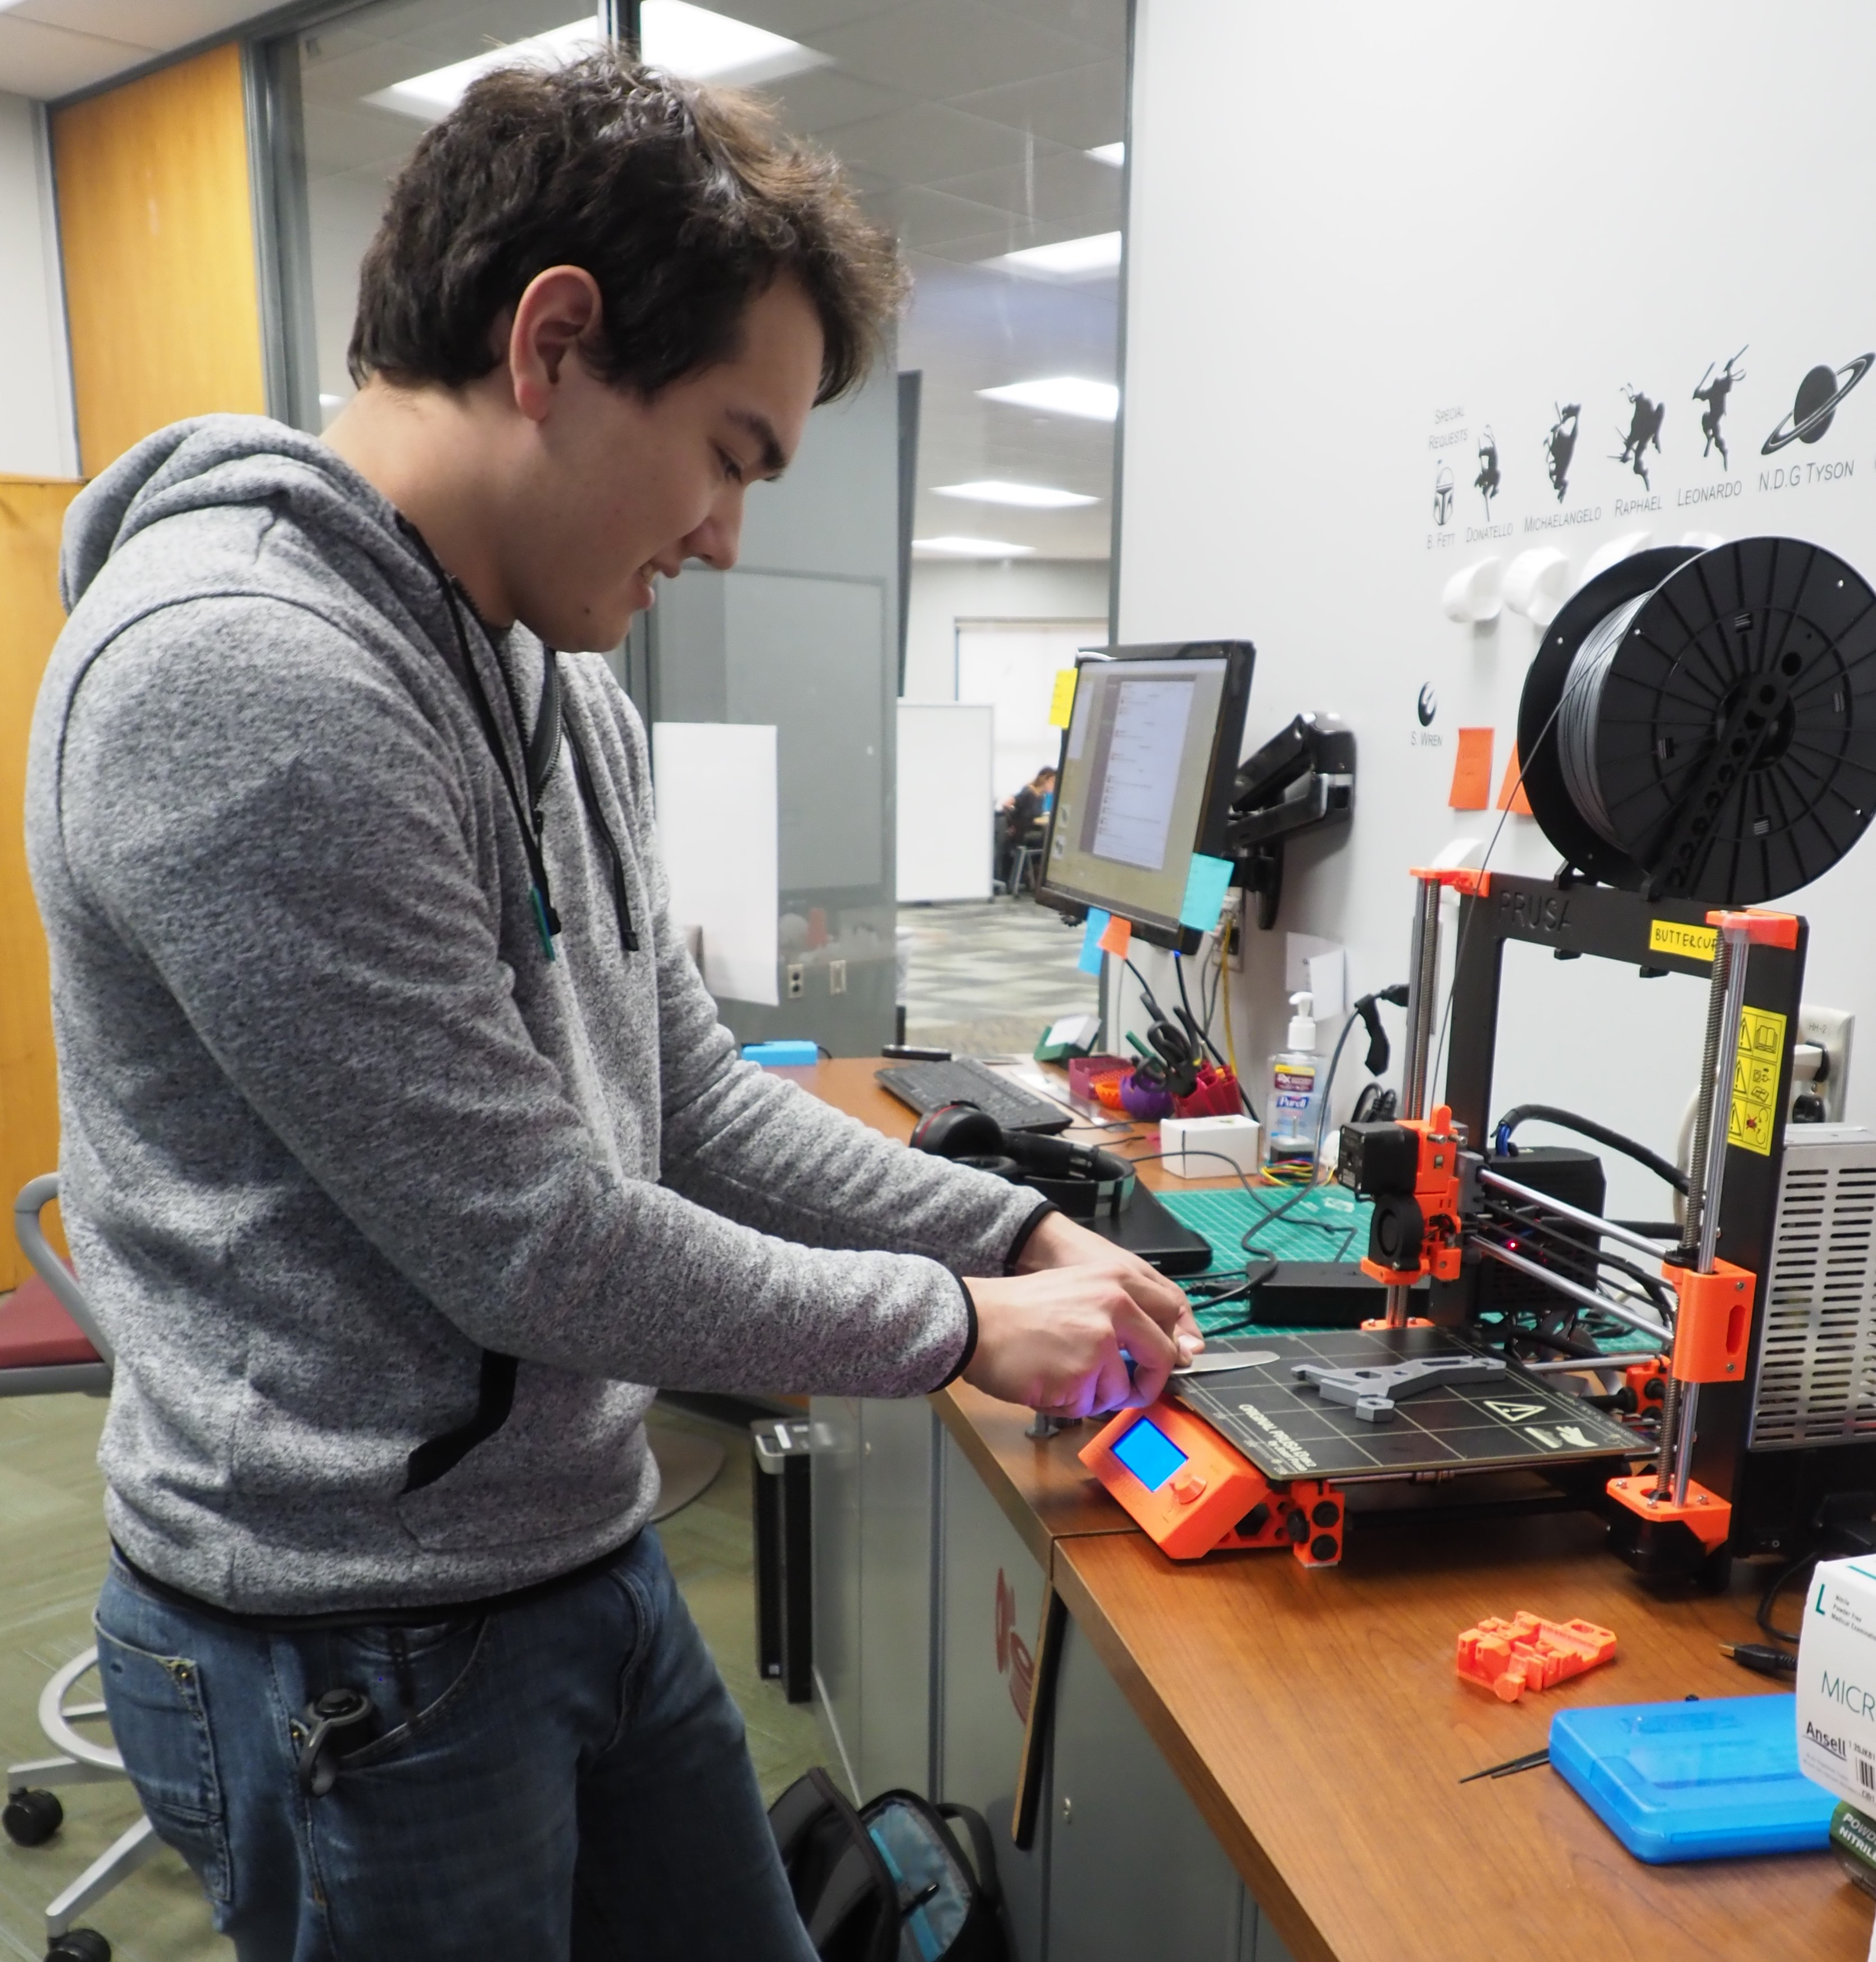 3D Design Studio staff work on a 3D printer